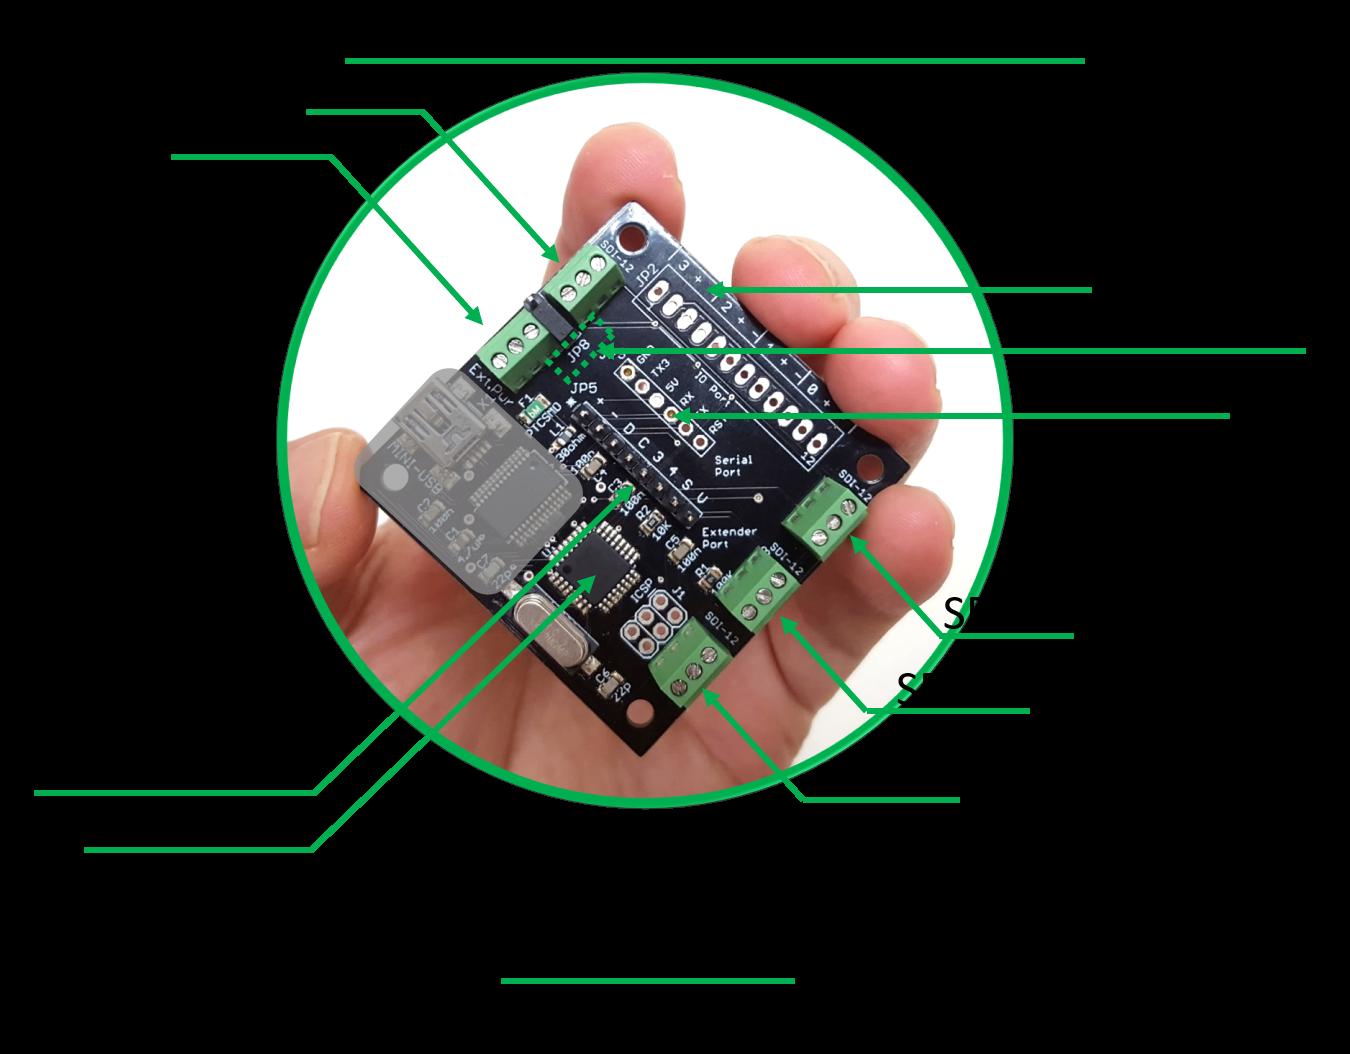 SDI-12 TTL adapter